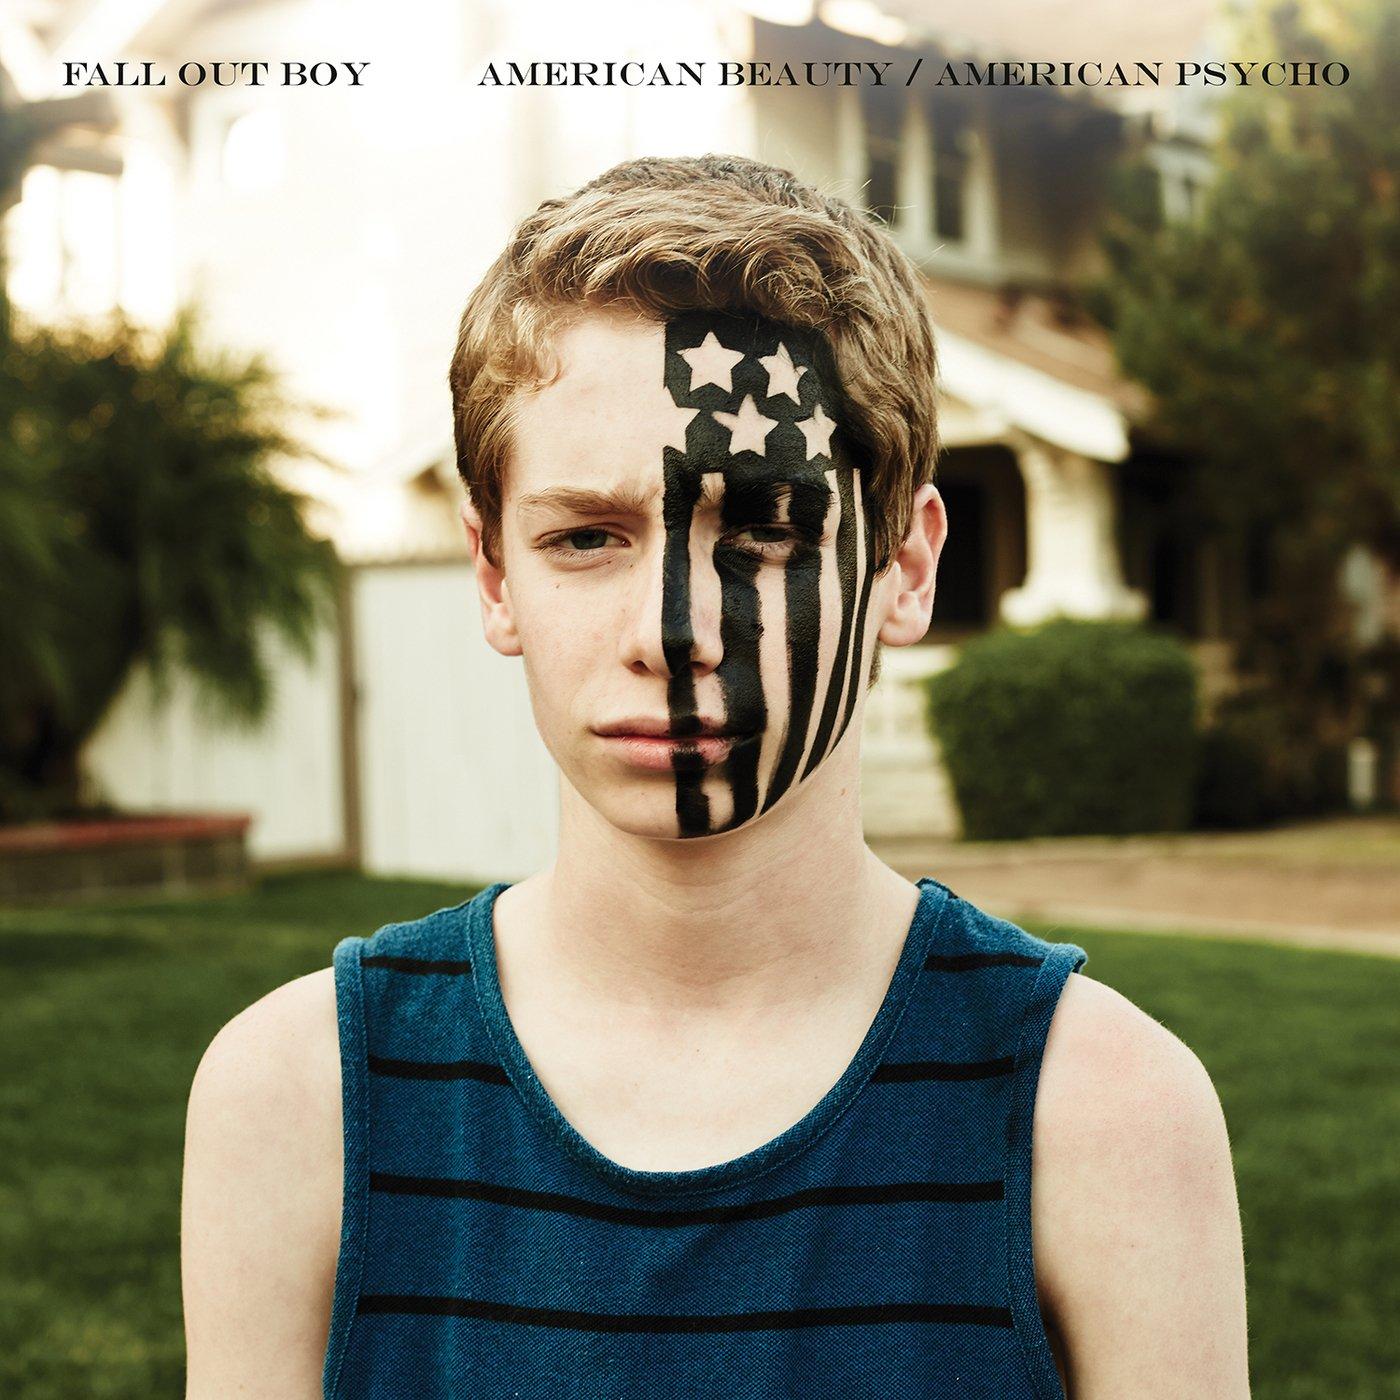 fall out boy,フォールアウトボーイ,曲,一覧,人気,おすすめ, 画像